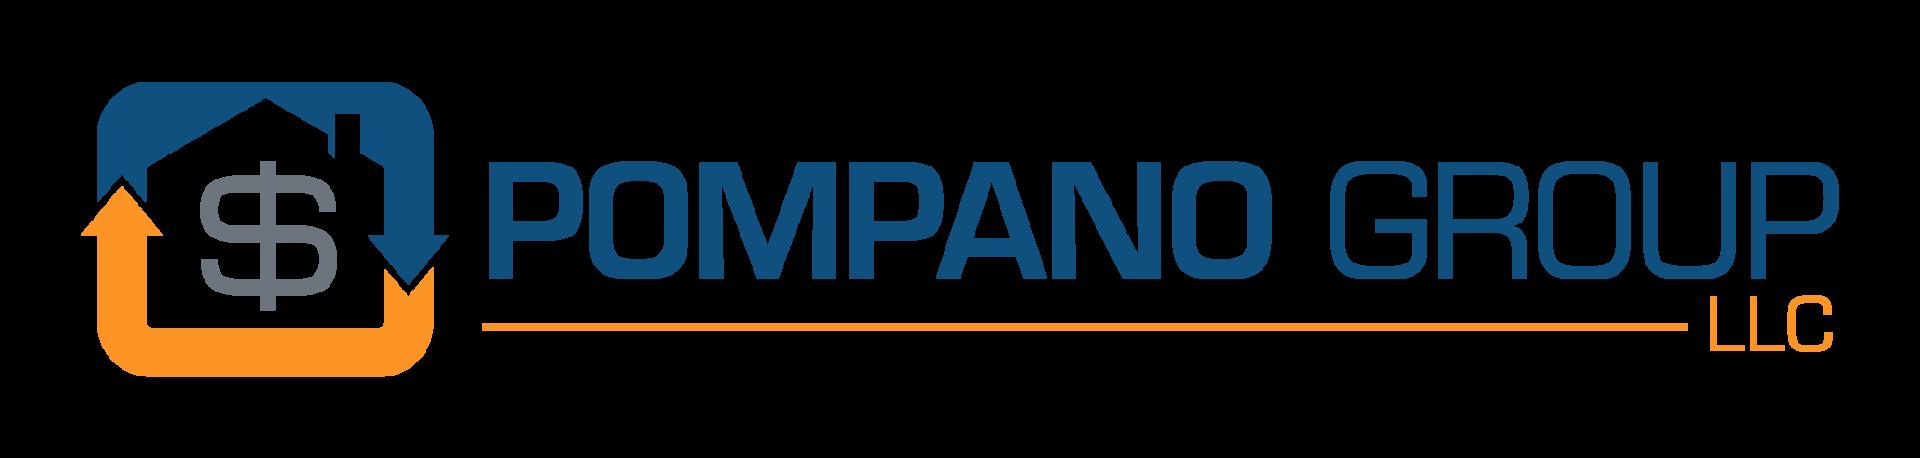 Pompano Group LLC logo